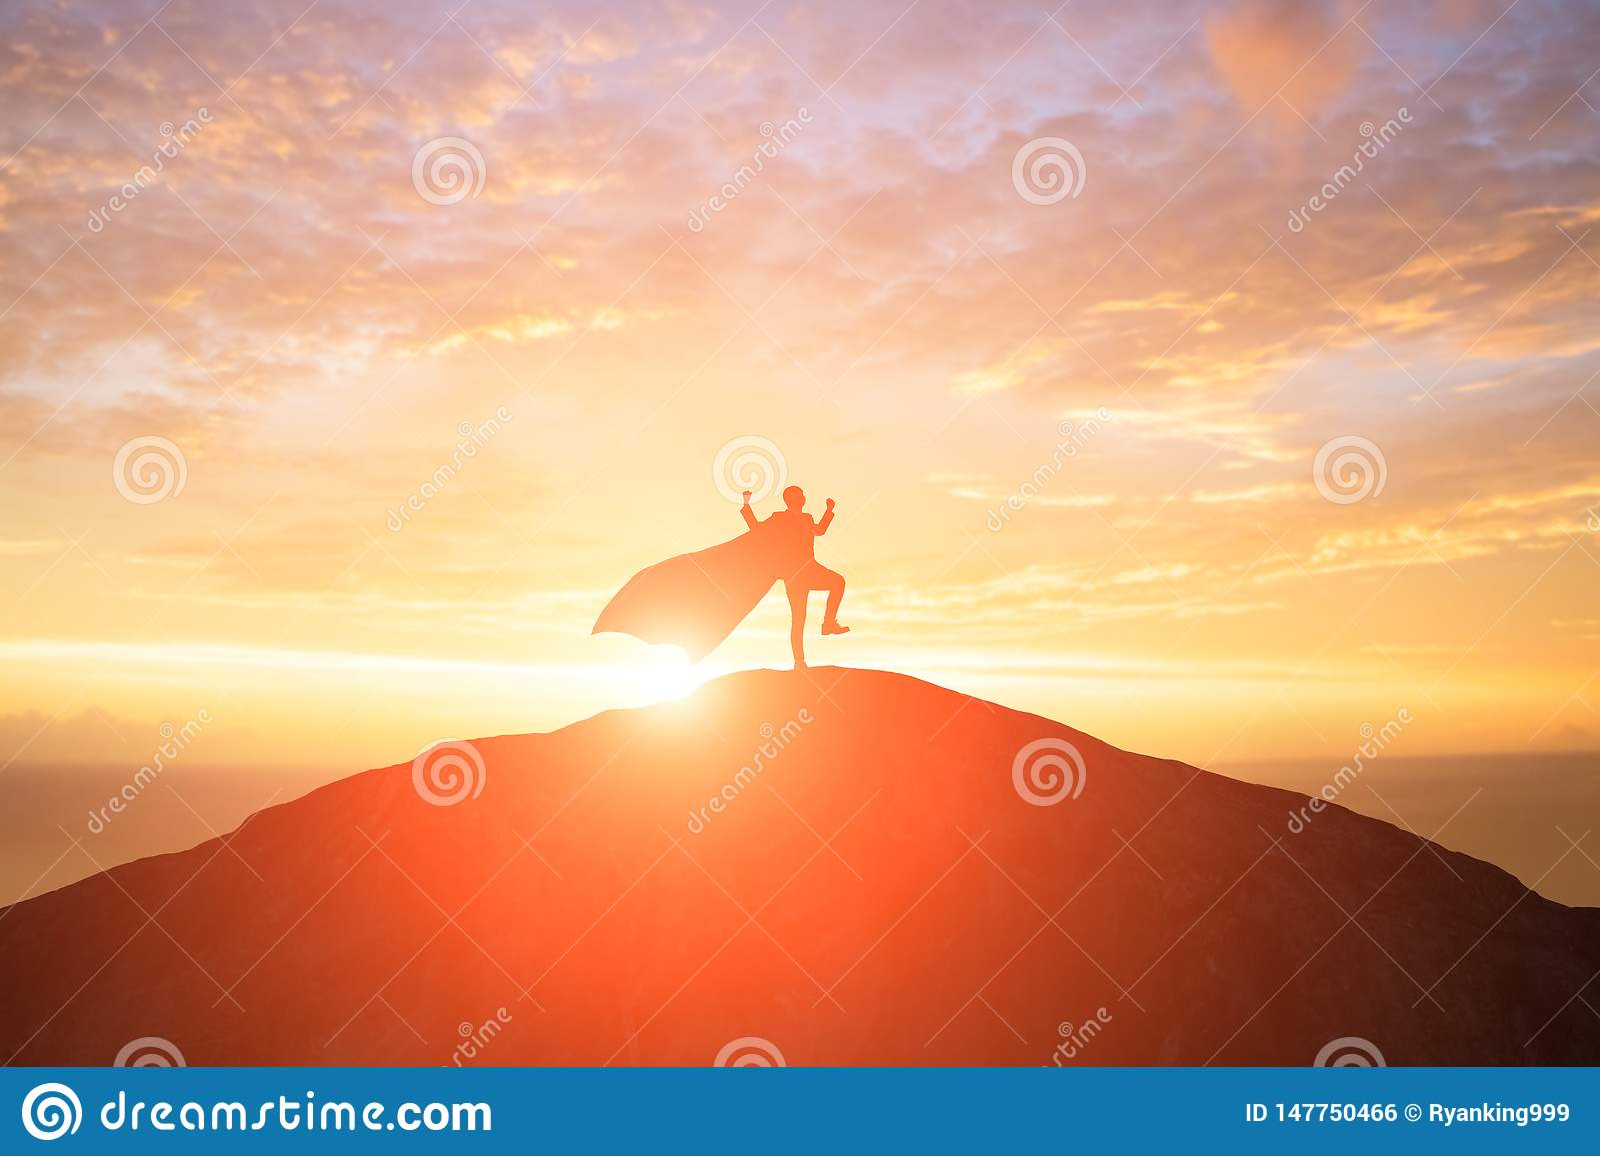 Silhouette of super businessman